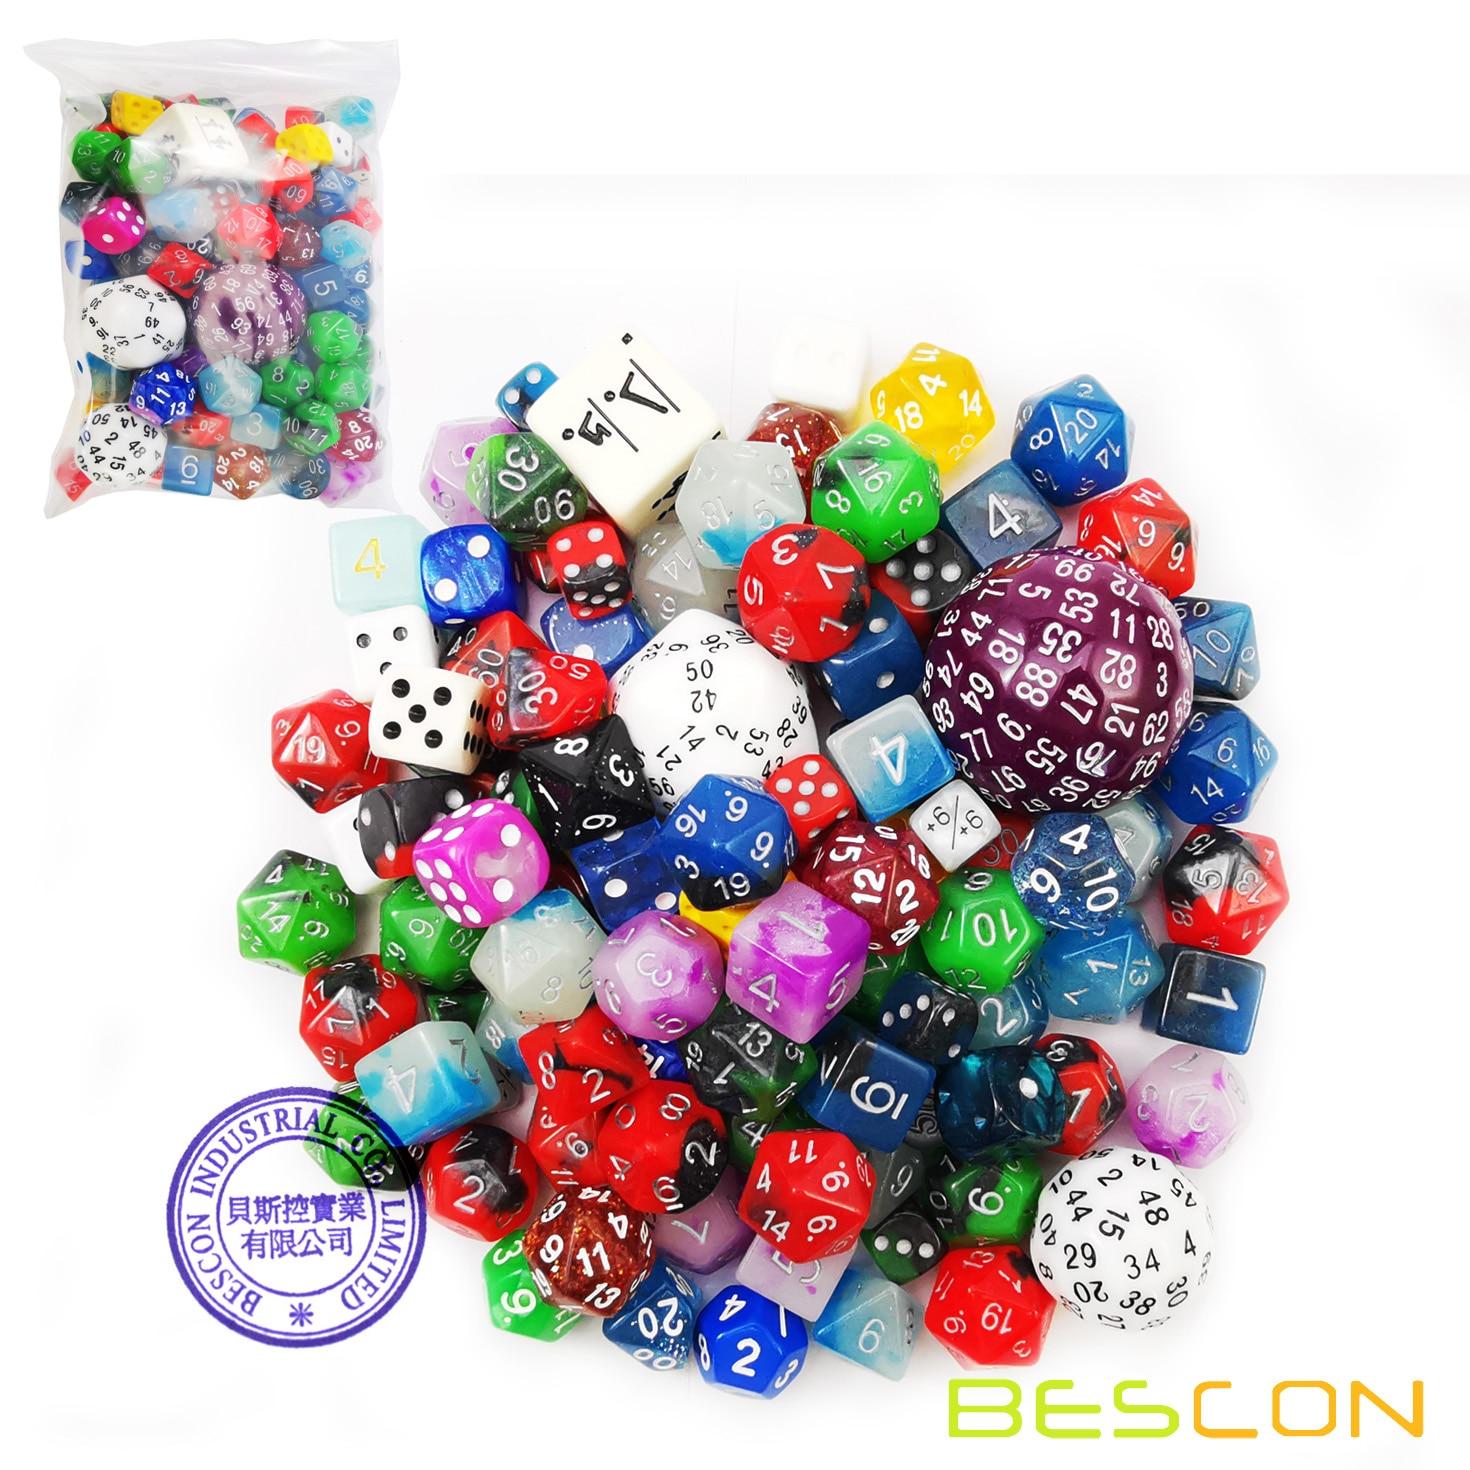 Bescon Big Better Rejects Dice Pack 100+, Second Dice Set 100pcs